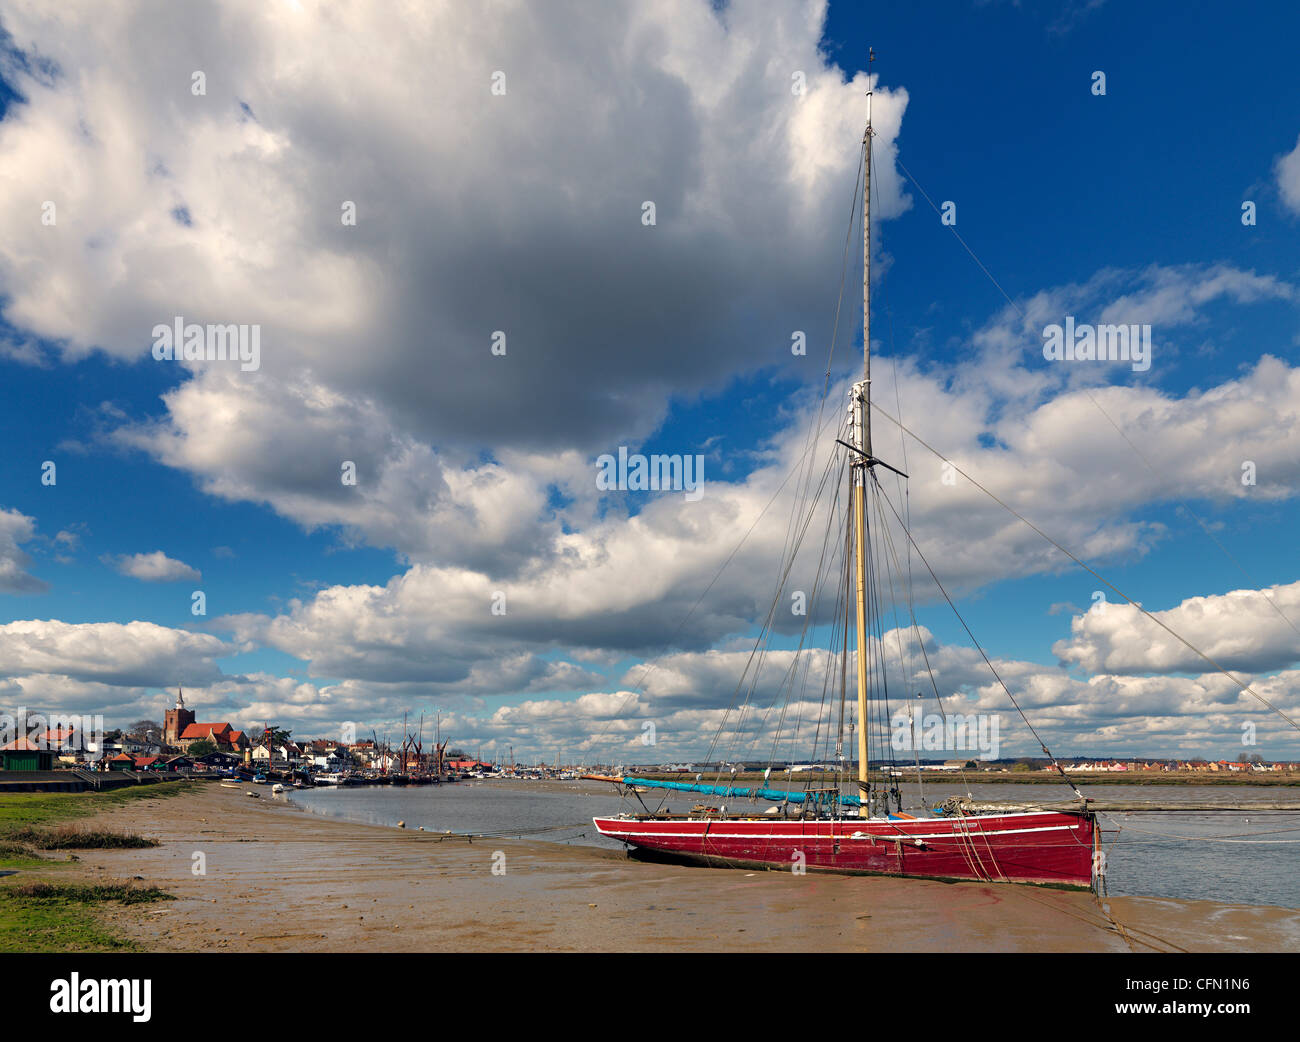 Maldon on the Blackwater Estuary, looking towards Hythe Quay - Stock Image